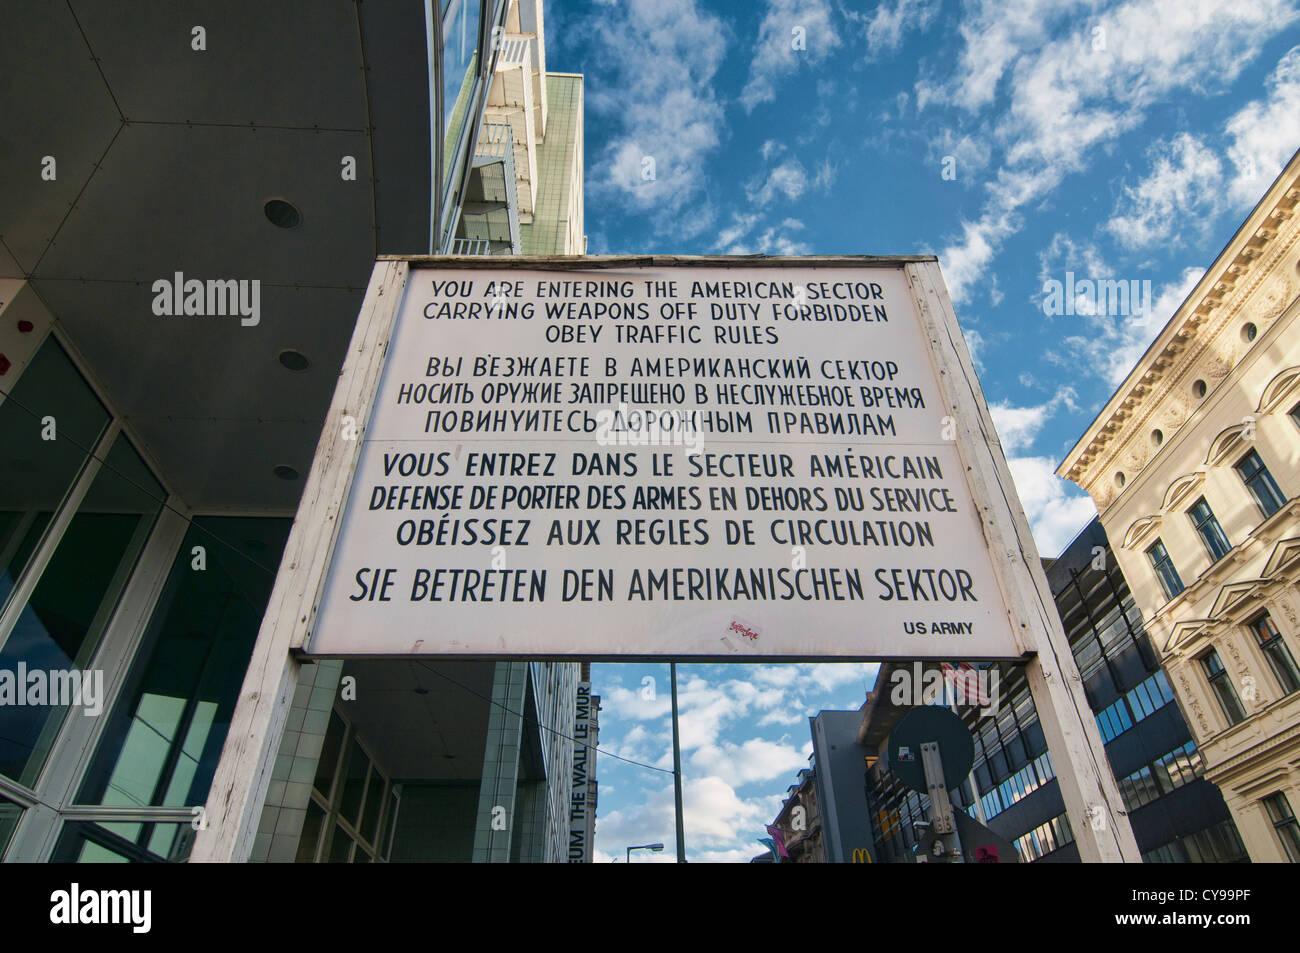 Memorial firmar al sitio histórico Checkpoint Charlie en Berlín, Alemania Imagen De Stock